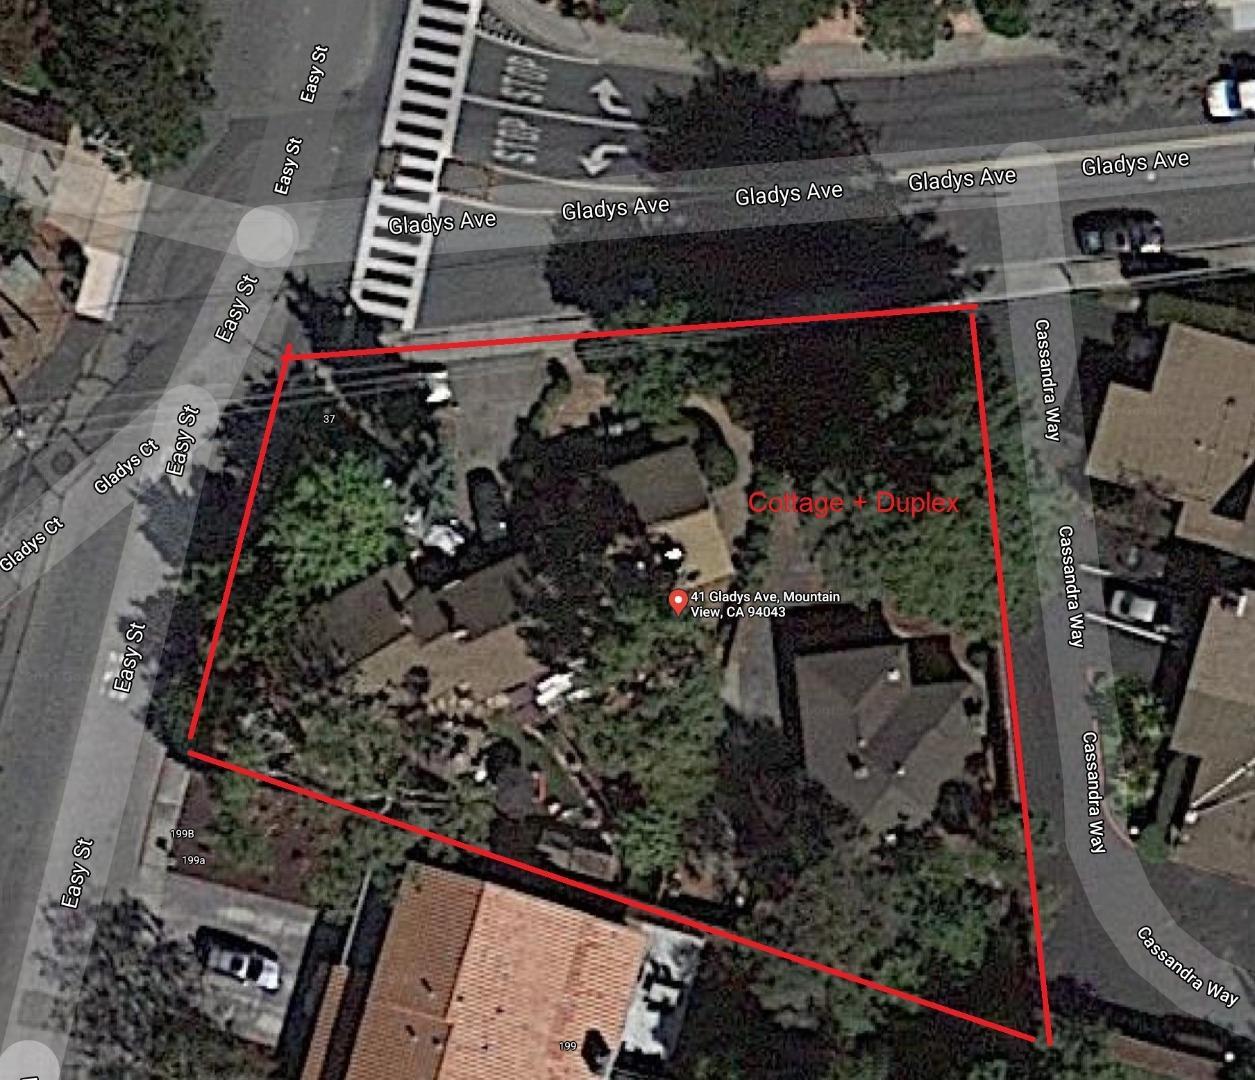 41 Gladys AVE Mountain View CA 94043